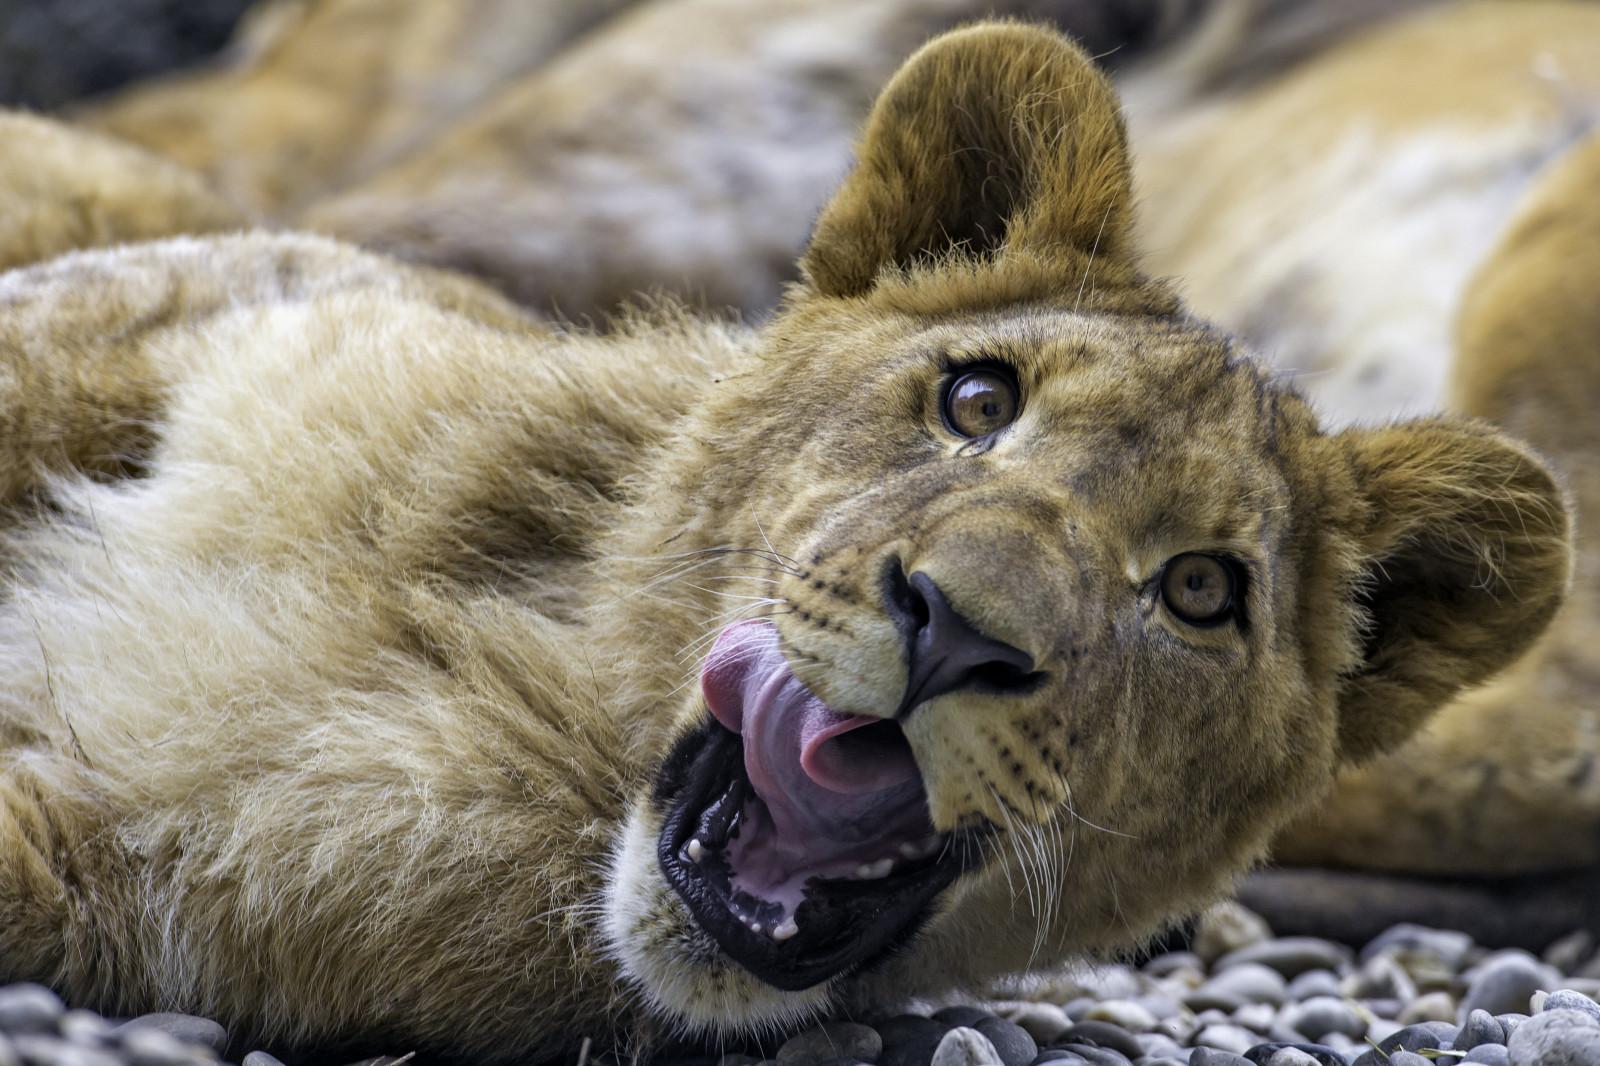 8k Animal Wallpaper Download: Wallpaper : Face, Portrait, Lion, Wildlife, Switzerland